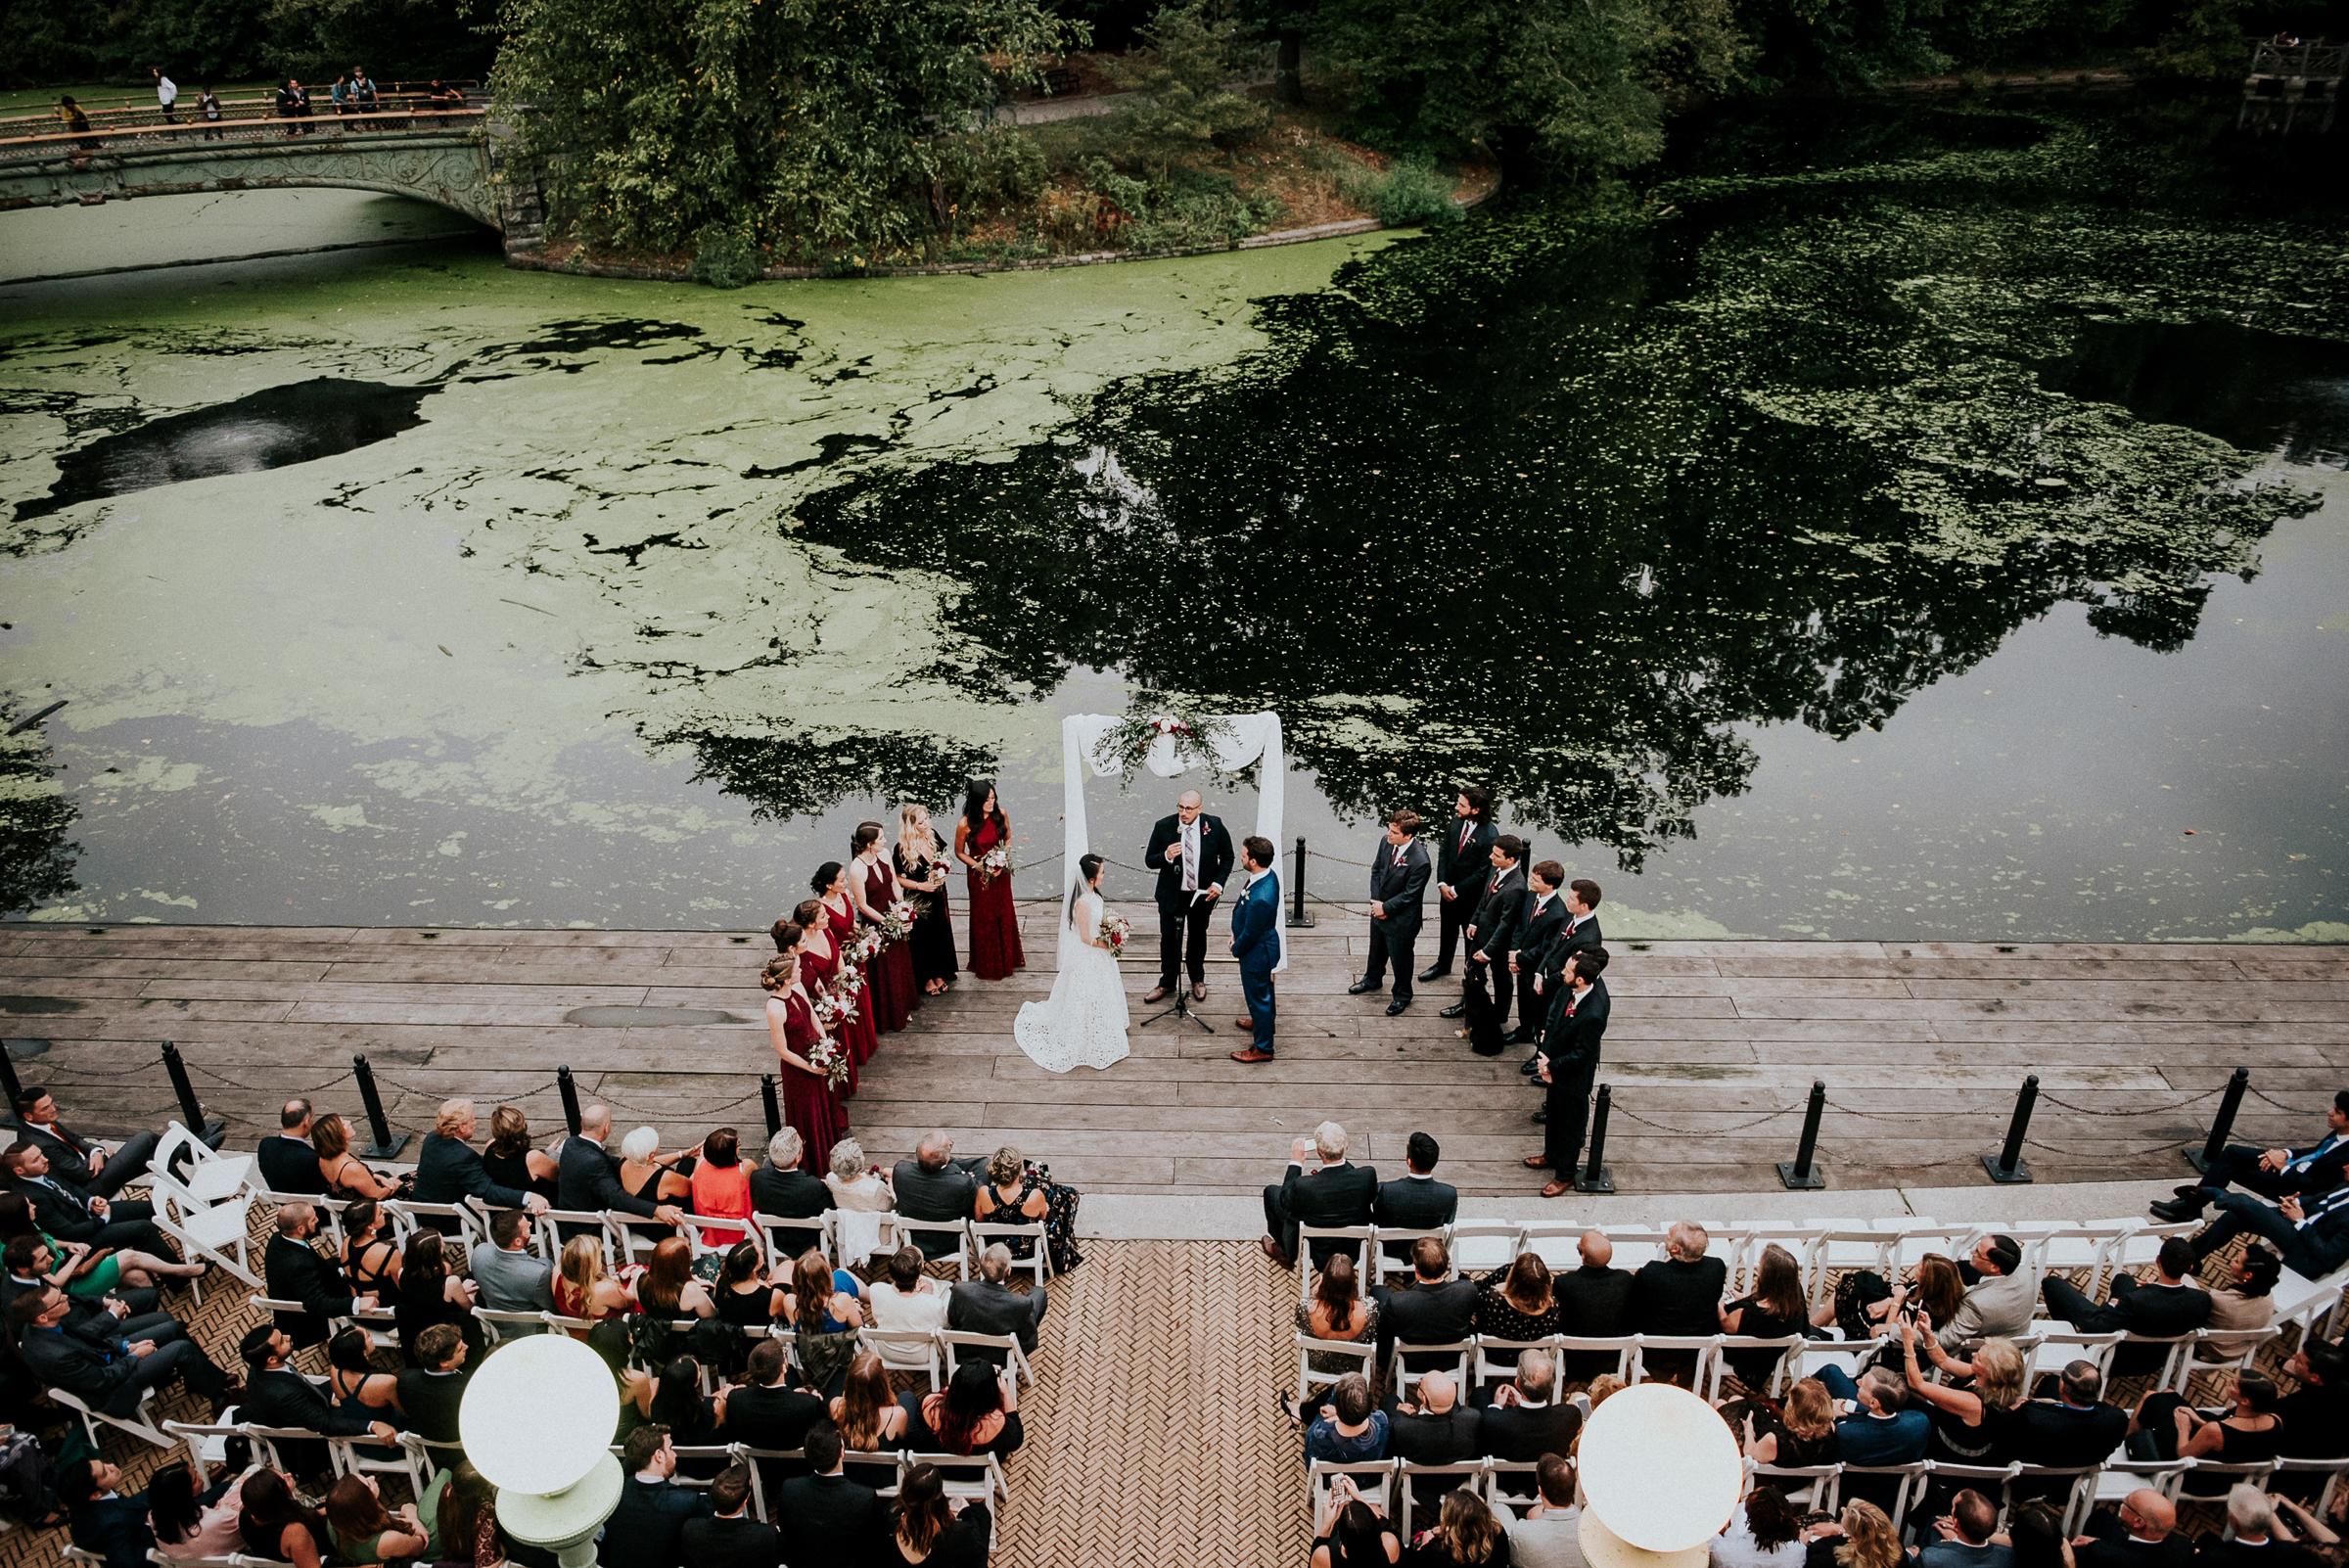 New-York-Documentary-Wedding-Photography-Best-Of-2017-by-Elvira-Kalviste-Photography-135.jpg